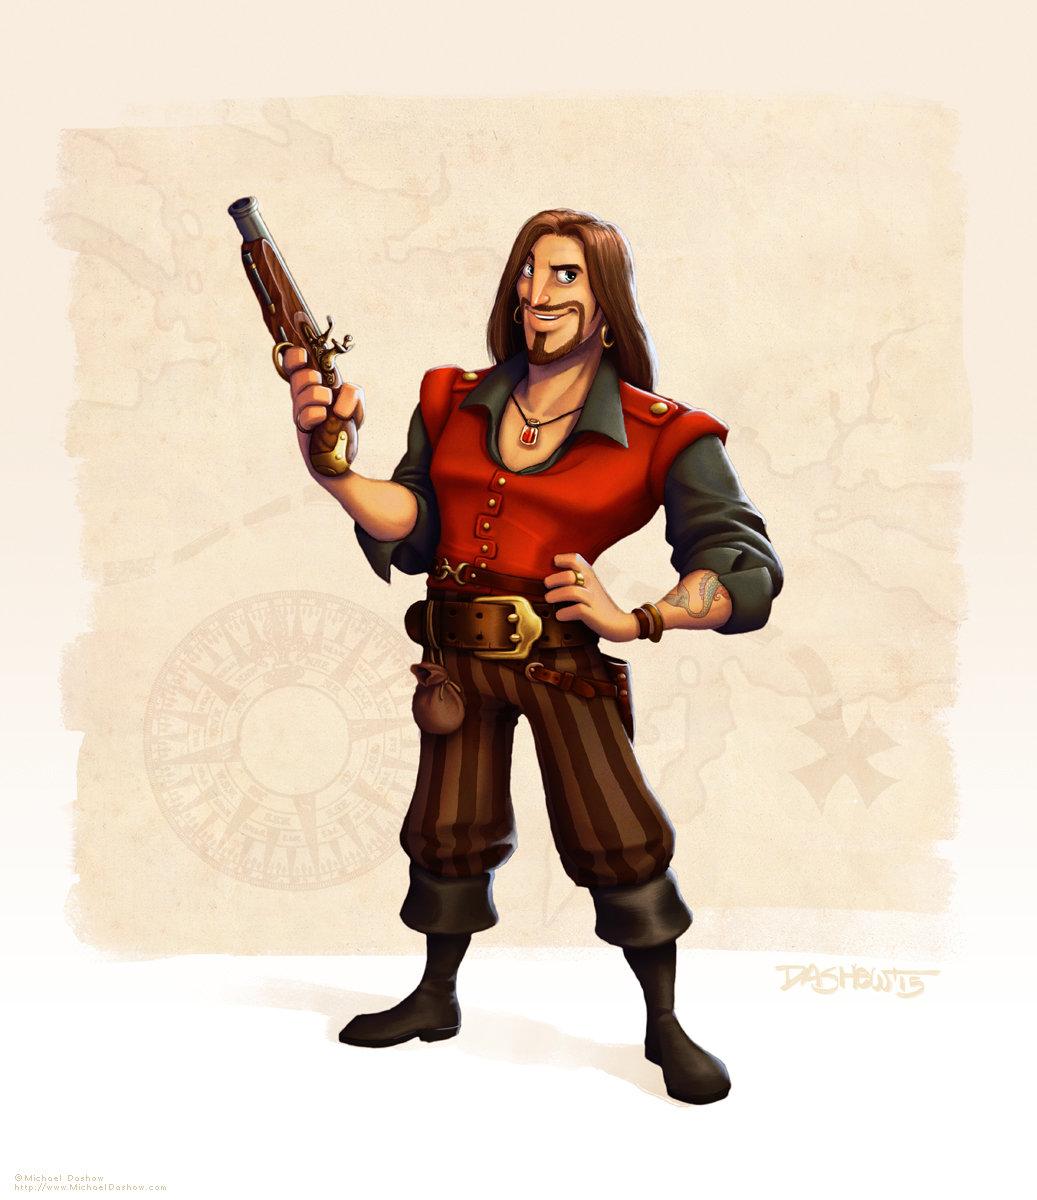 Michael dashow pirate sebastianblack final 1037x1200